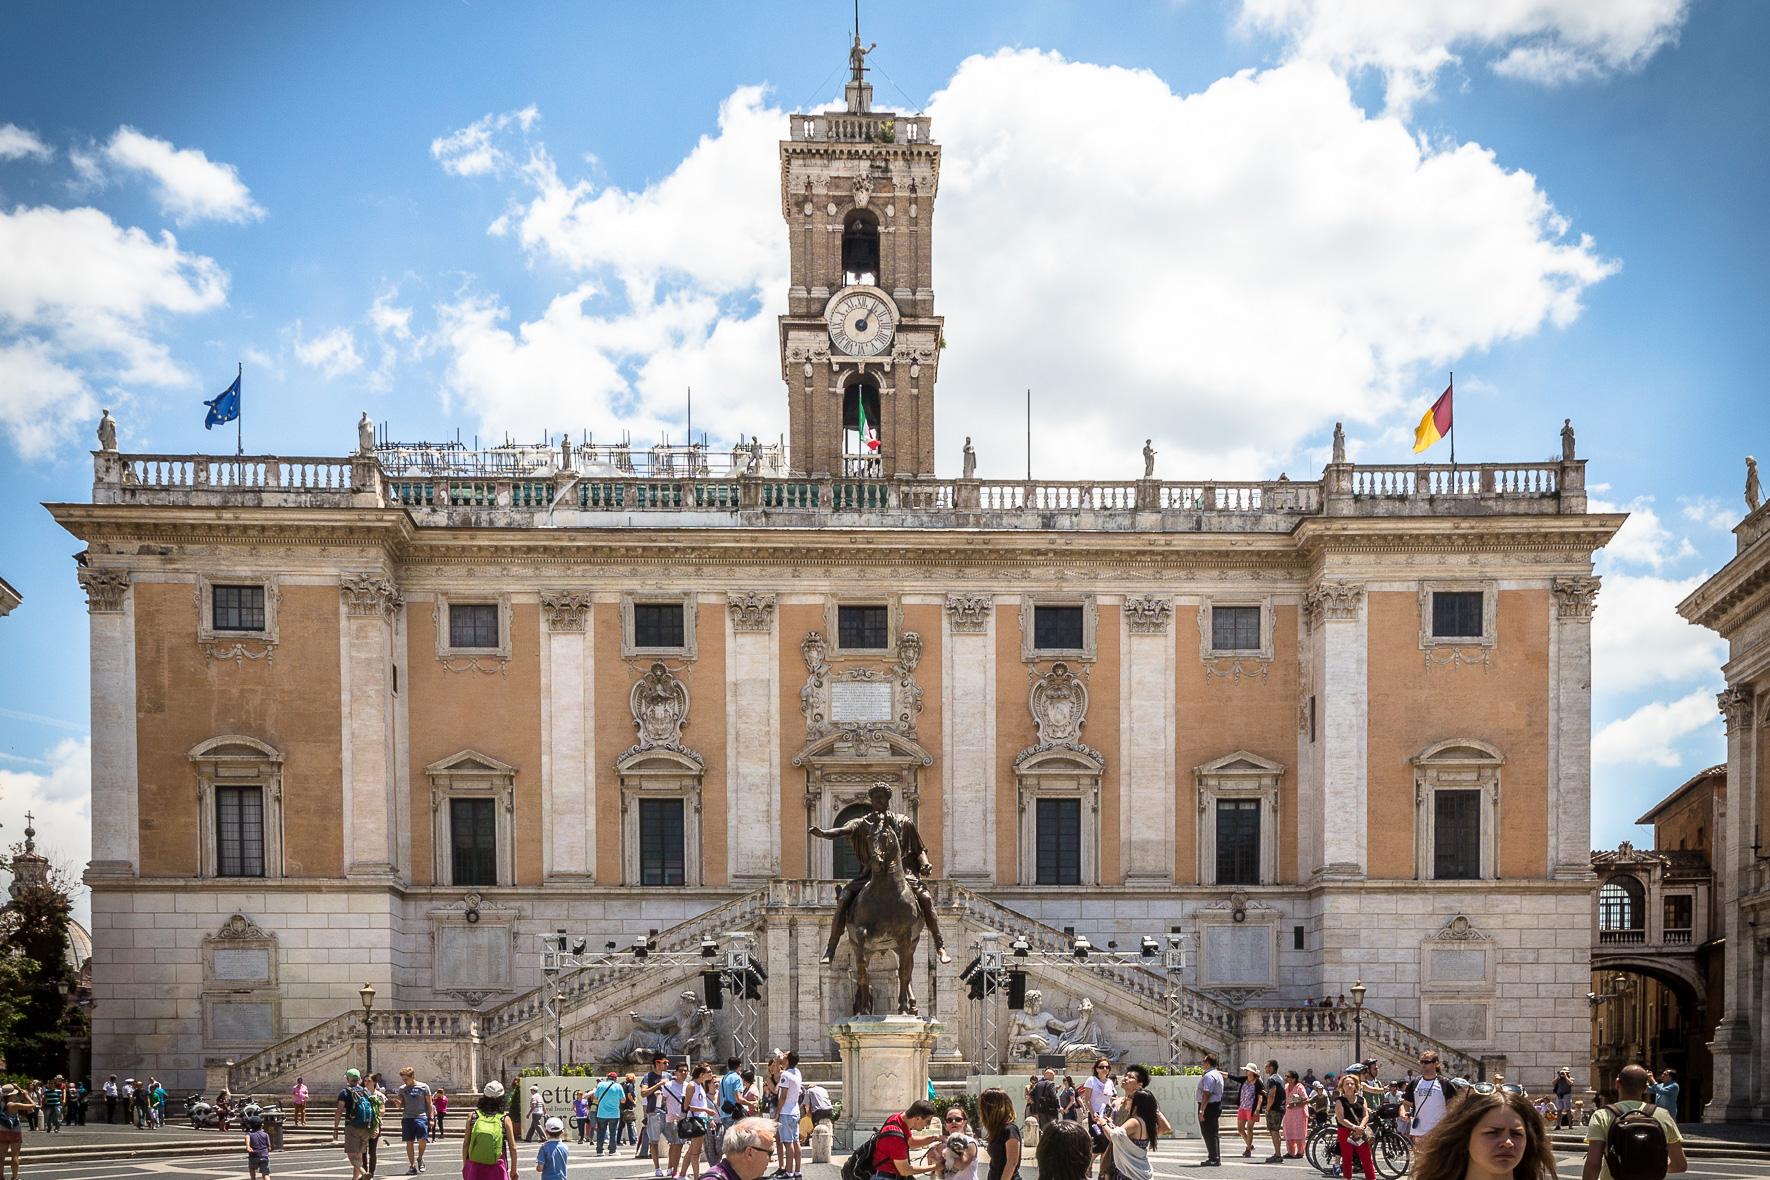 Senatorenpalast auf Kapitol Hügel in Rom